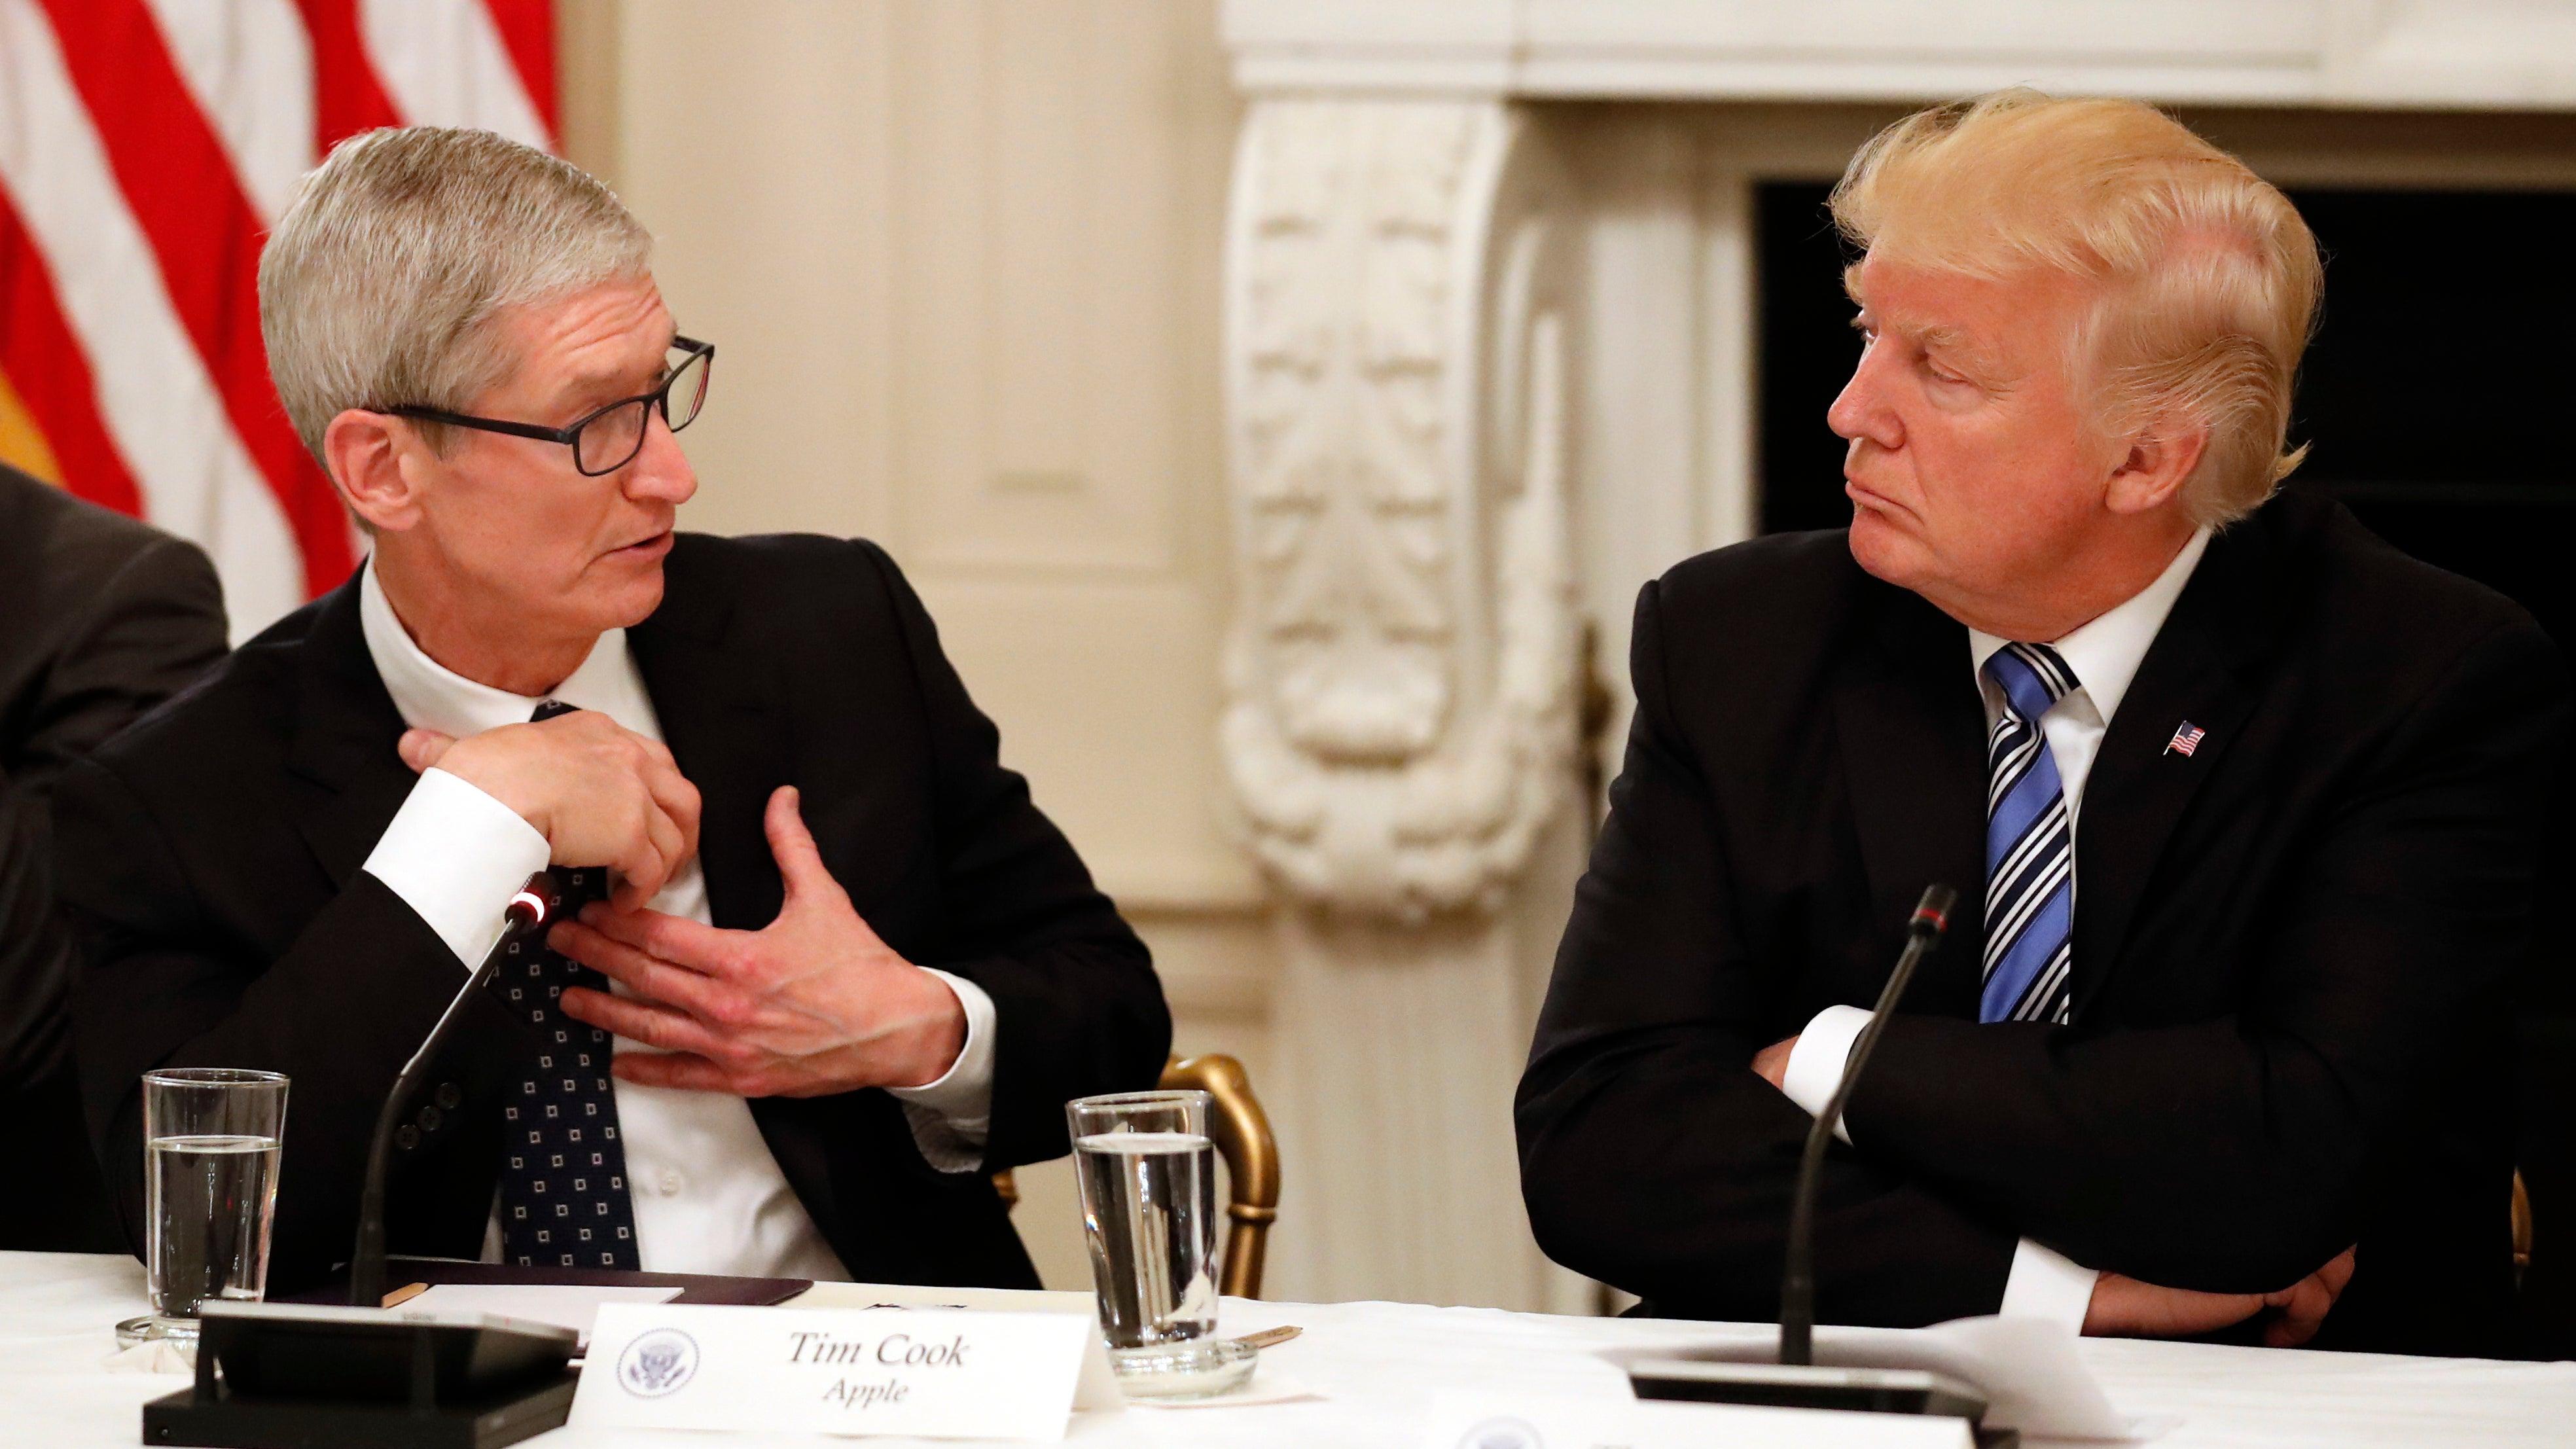 Apple Declines To Comment On Trump's Claim Tim Cook 'Promised Me 3 Big Plants: Big, Big, Big'